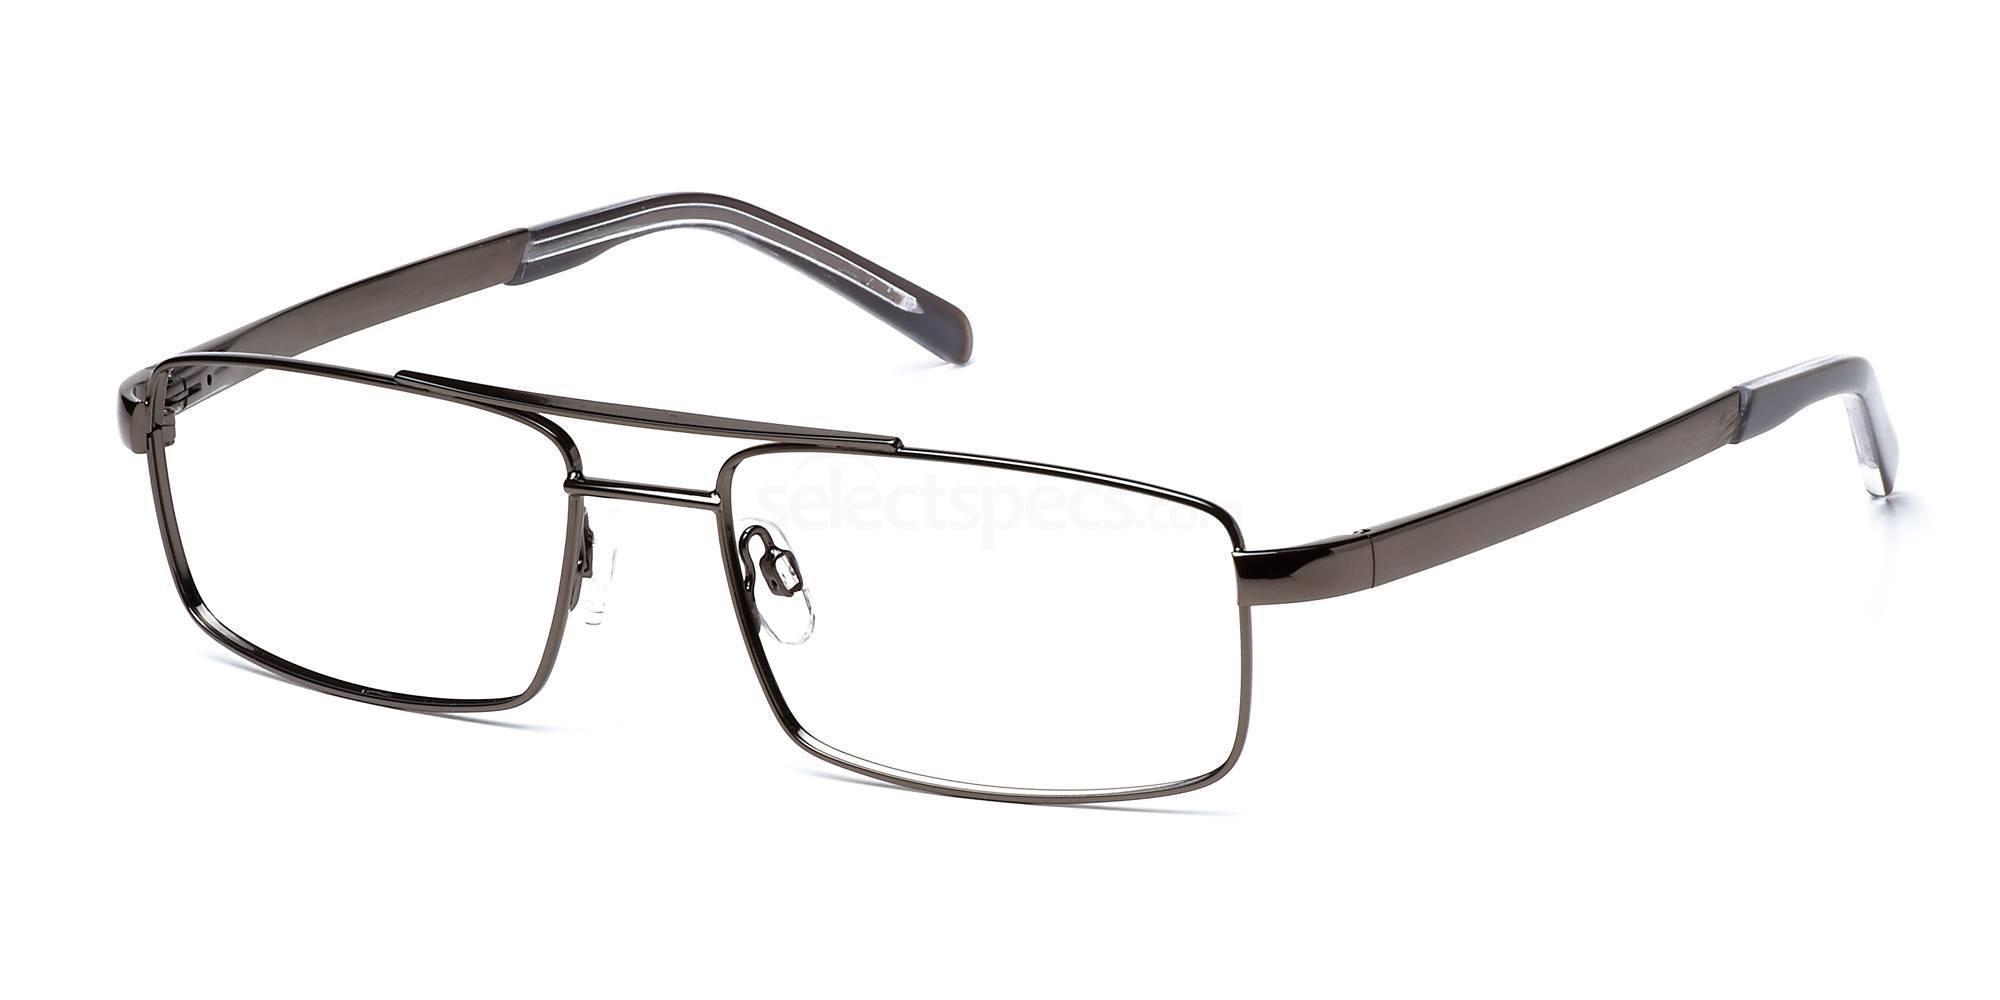 C1 SAMSON07 Glasses, Samson